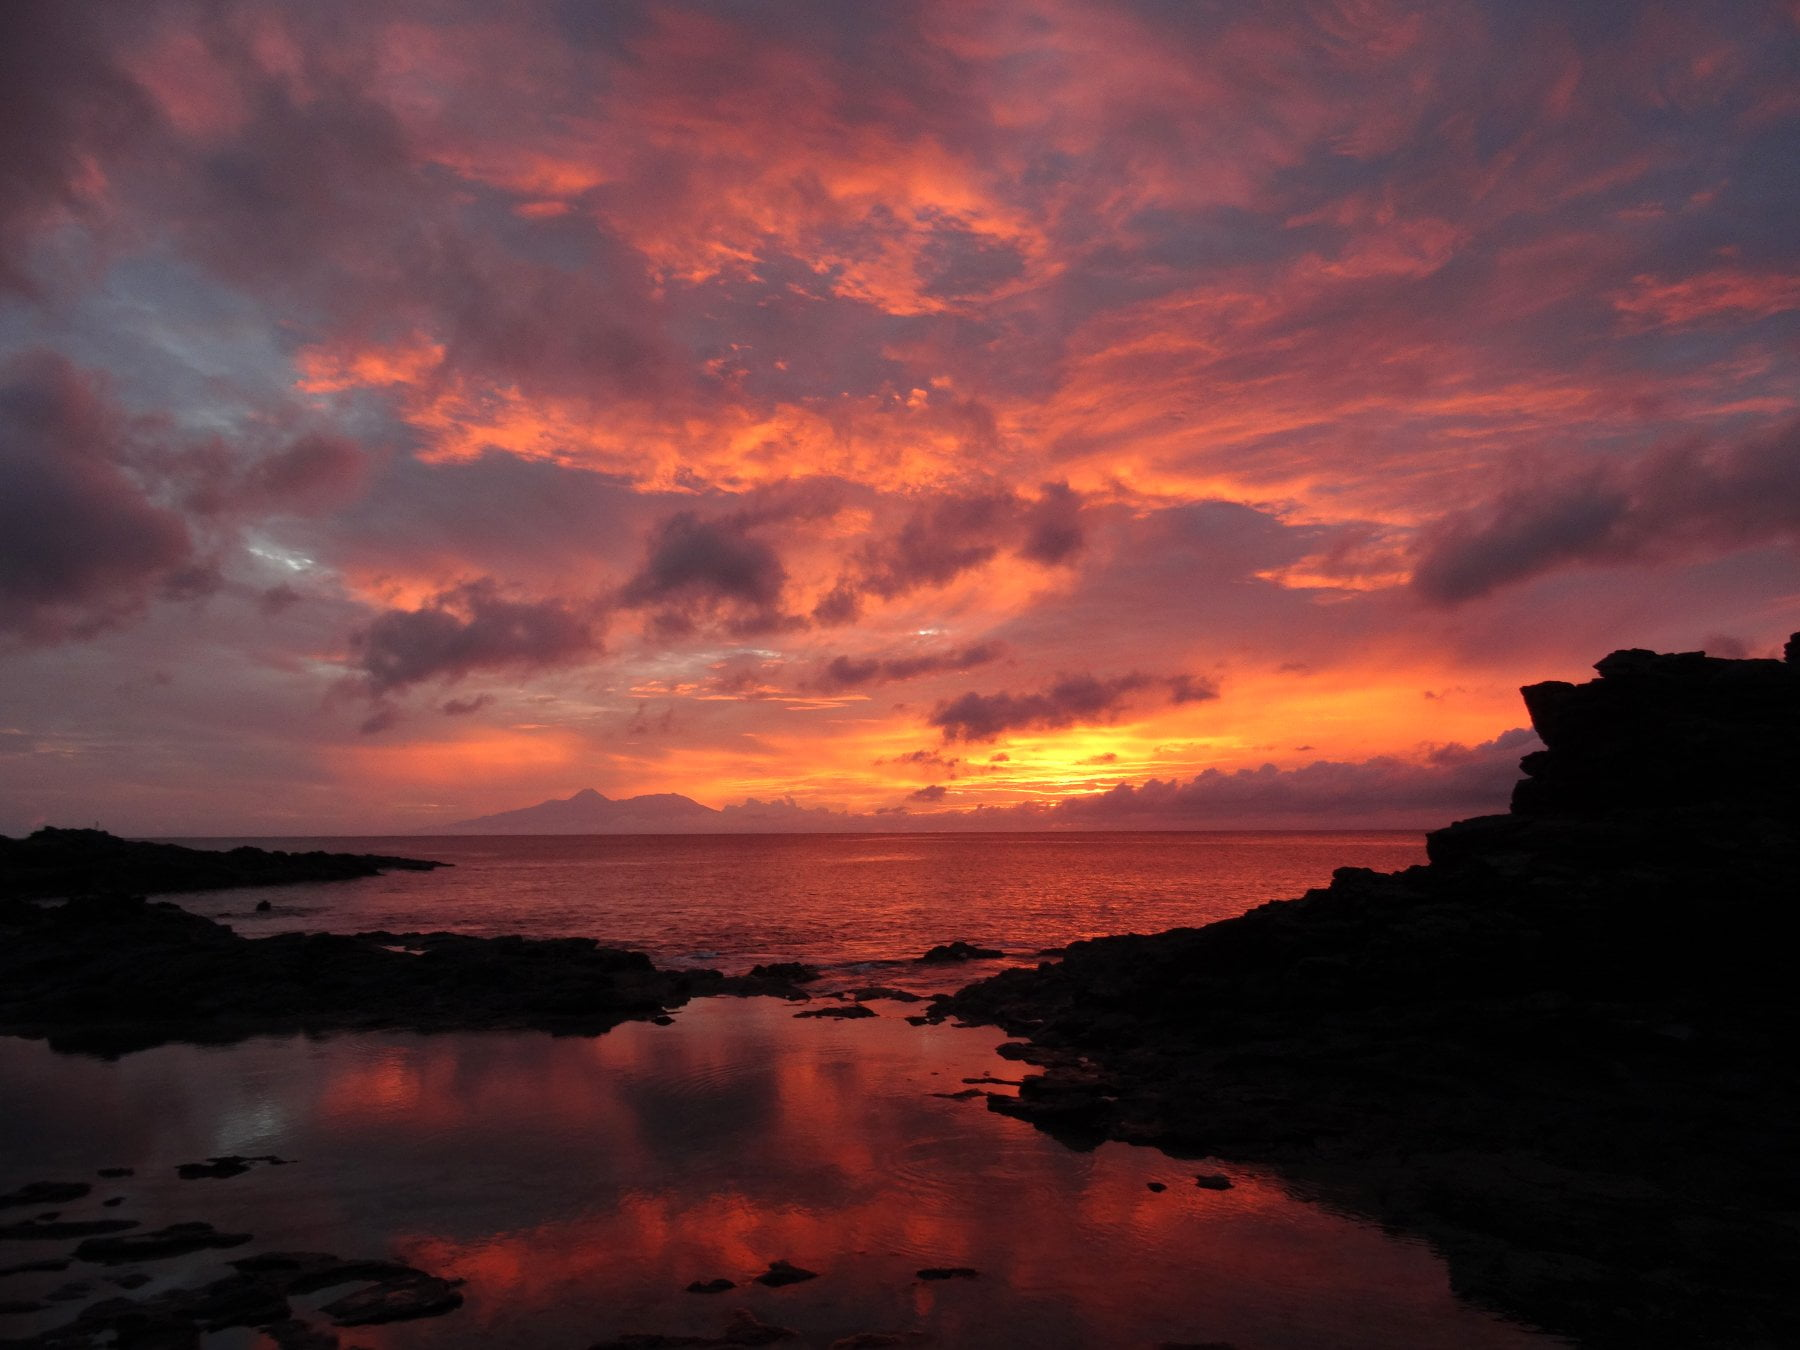 Sunset in Tarrafal on the Island of Santiago, Cabo Verde